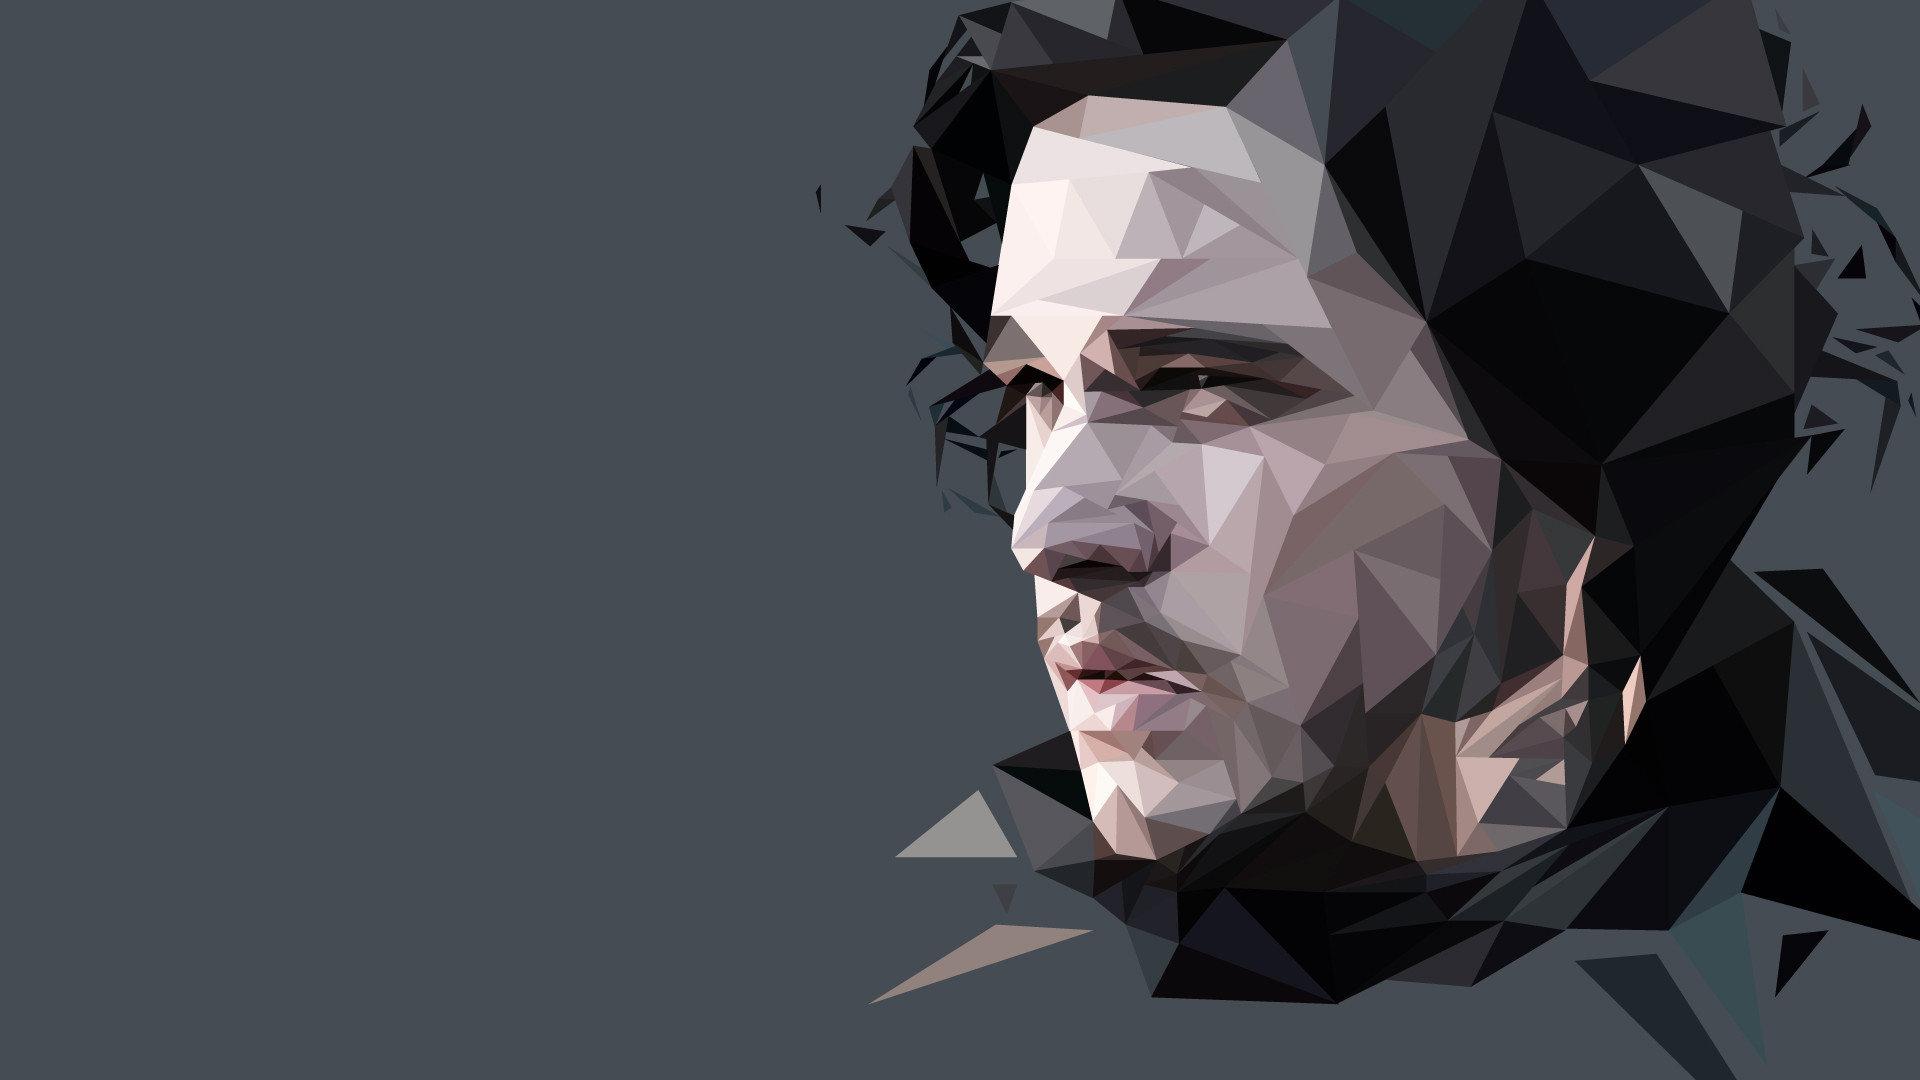 Download Jon Snow And Daenerys Wallpaper Hd Backgrounds